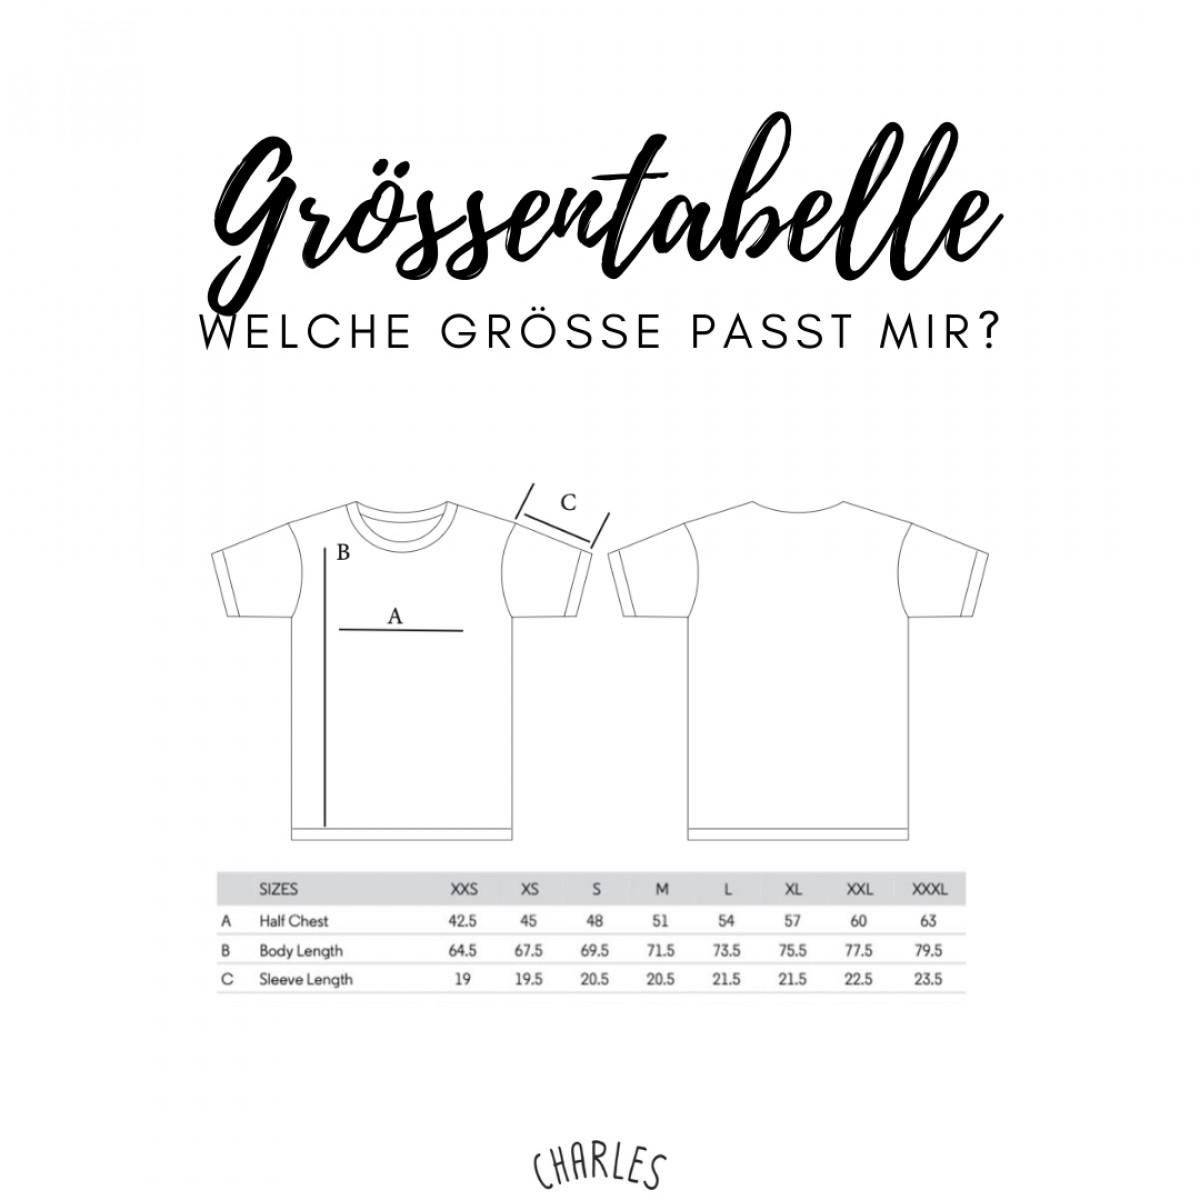 Charles / Shirt Bingen / 100% Biobaumwolle / Fair Wear zertifiziert